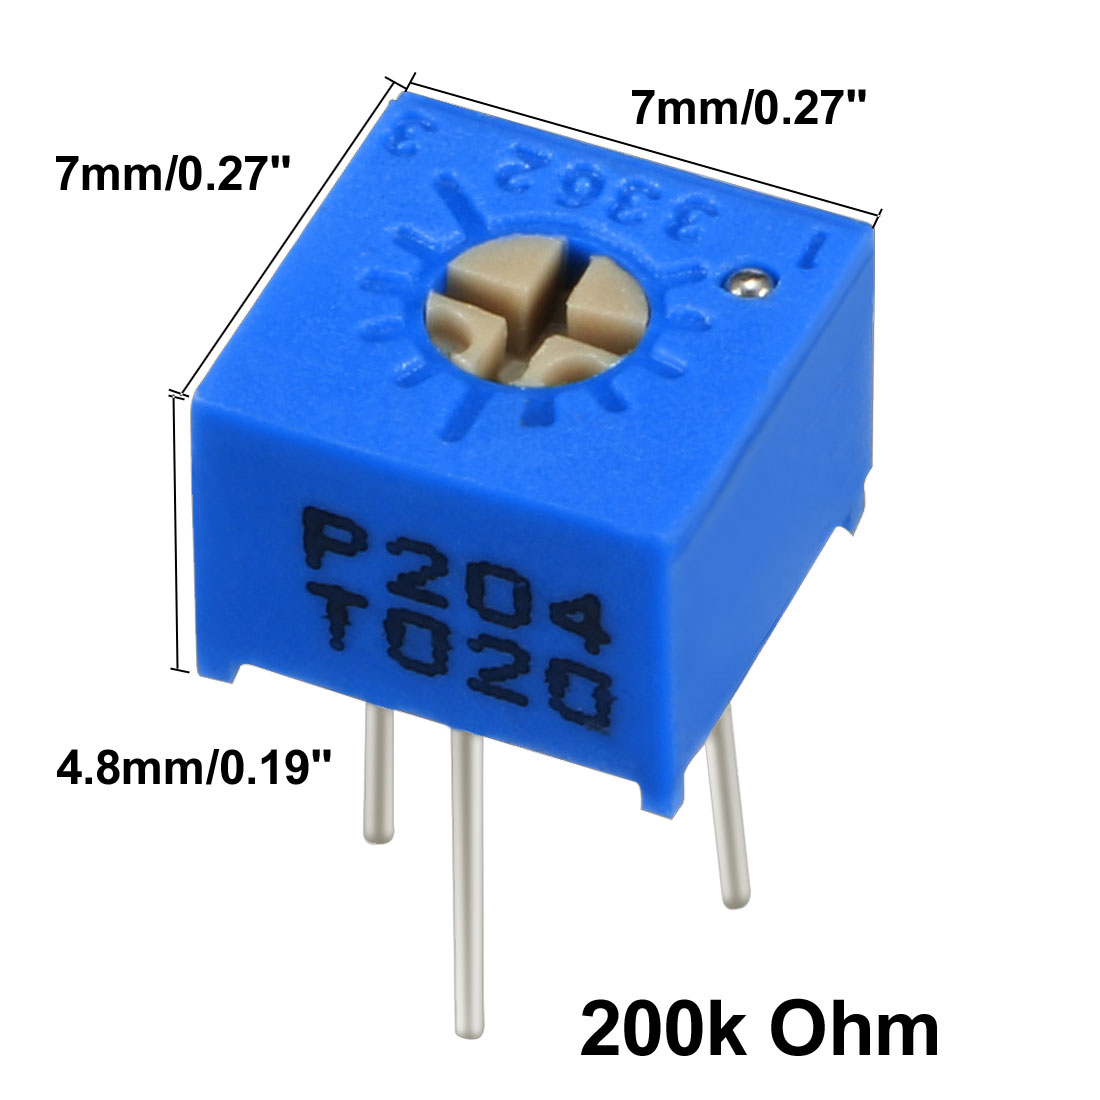 Resistors 200k Ohm Top Adjustment Horizontal Cermet Potentiometer 20 Pcs - image 2 de 6